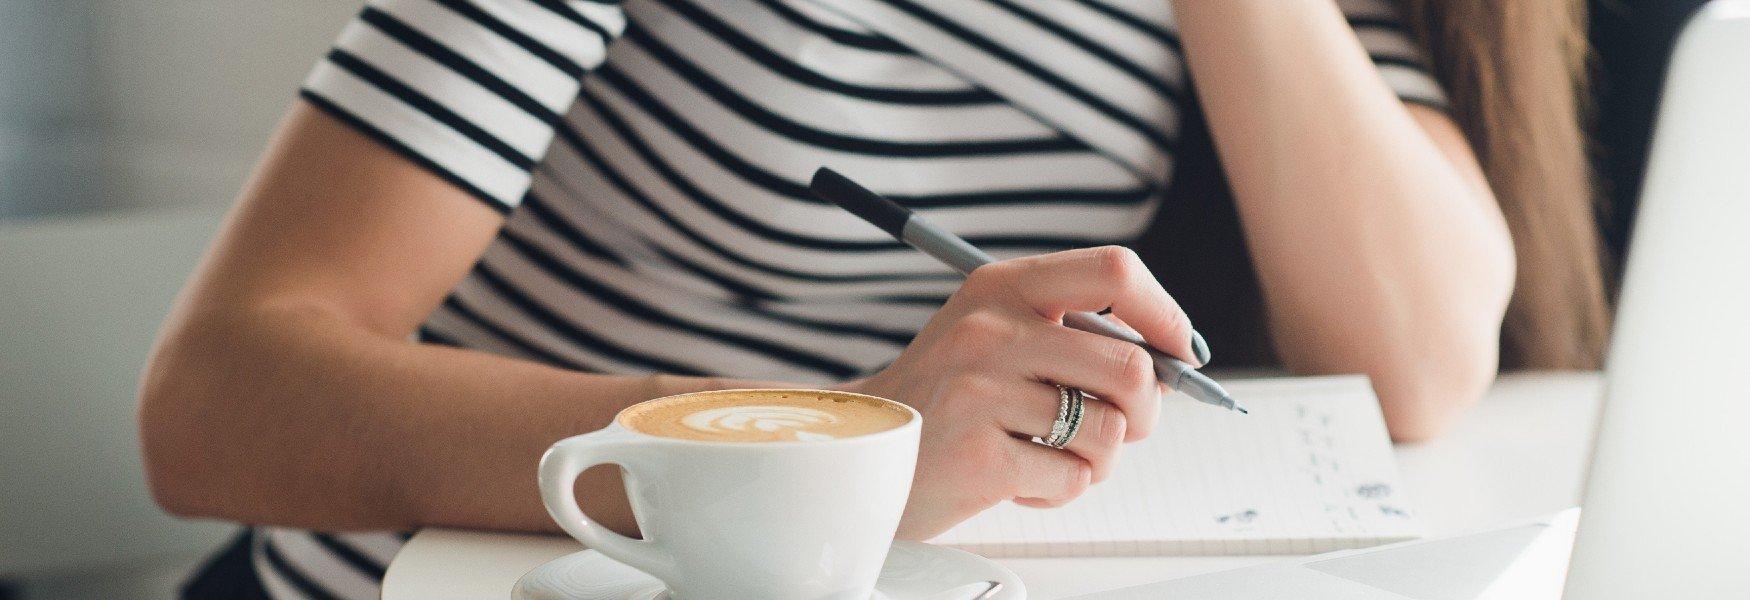 Vrouw Schrijft Brief